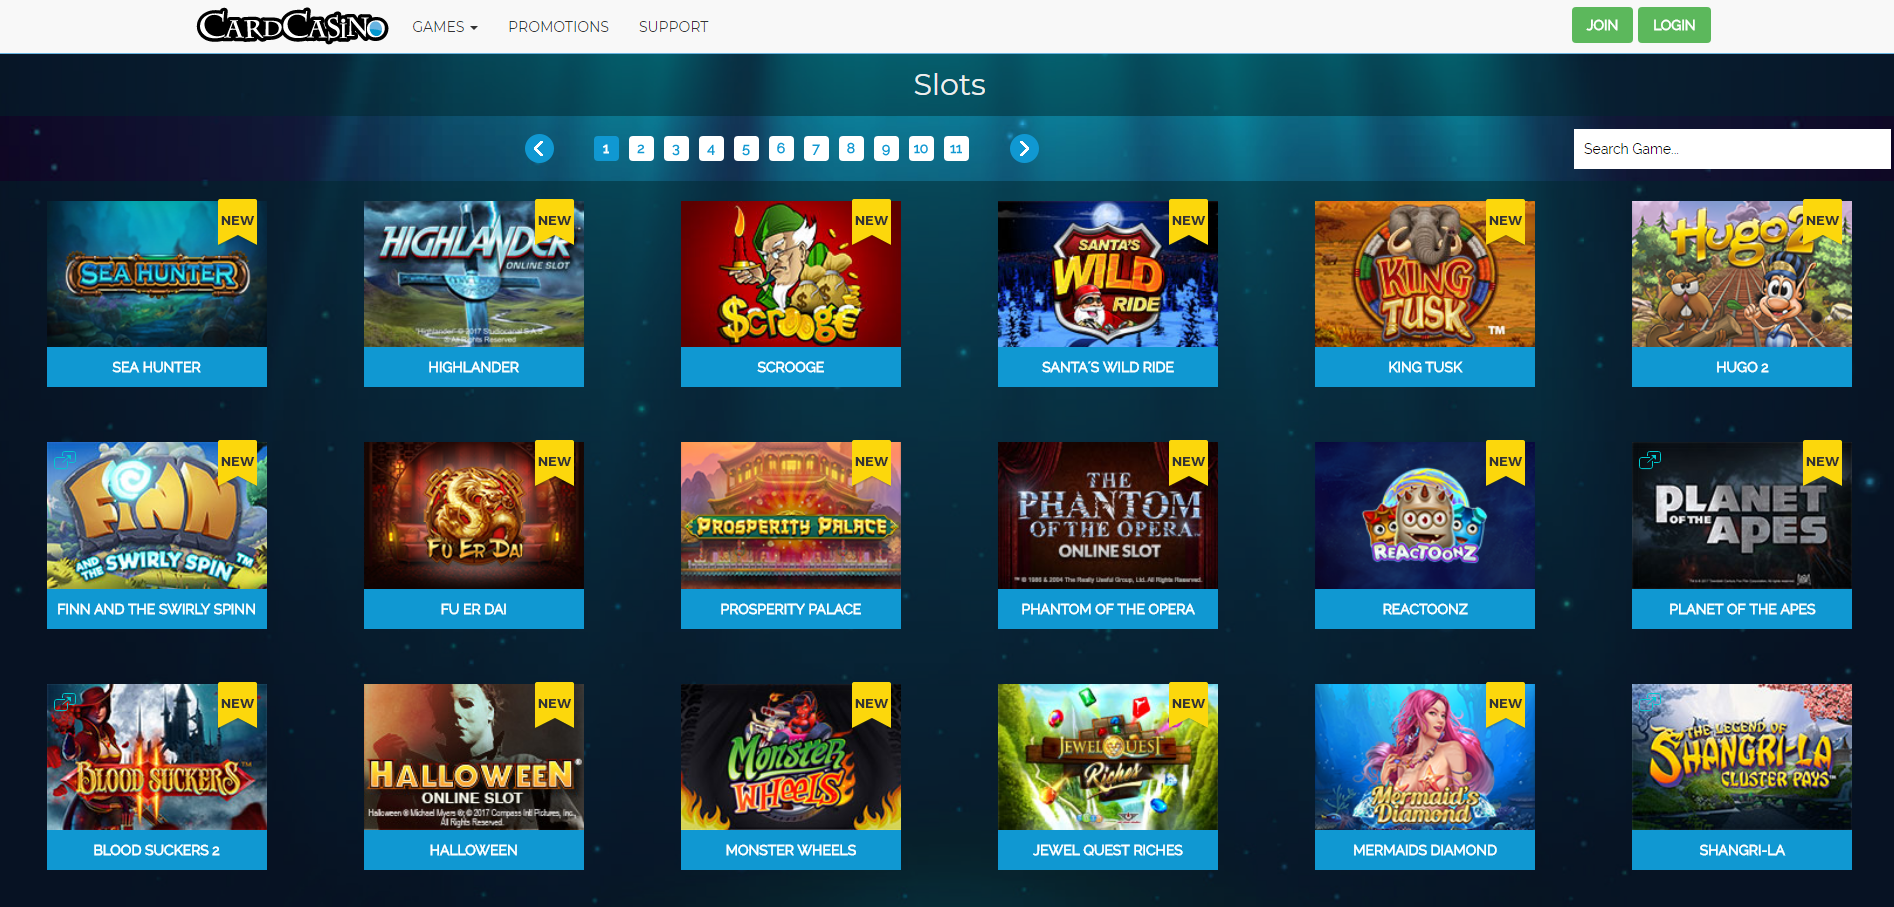 Slots-CardCasino-online